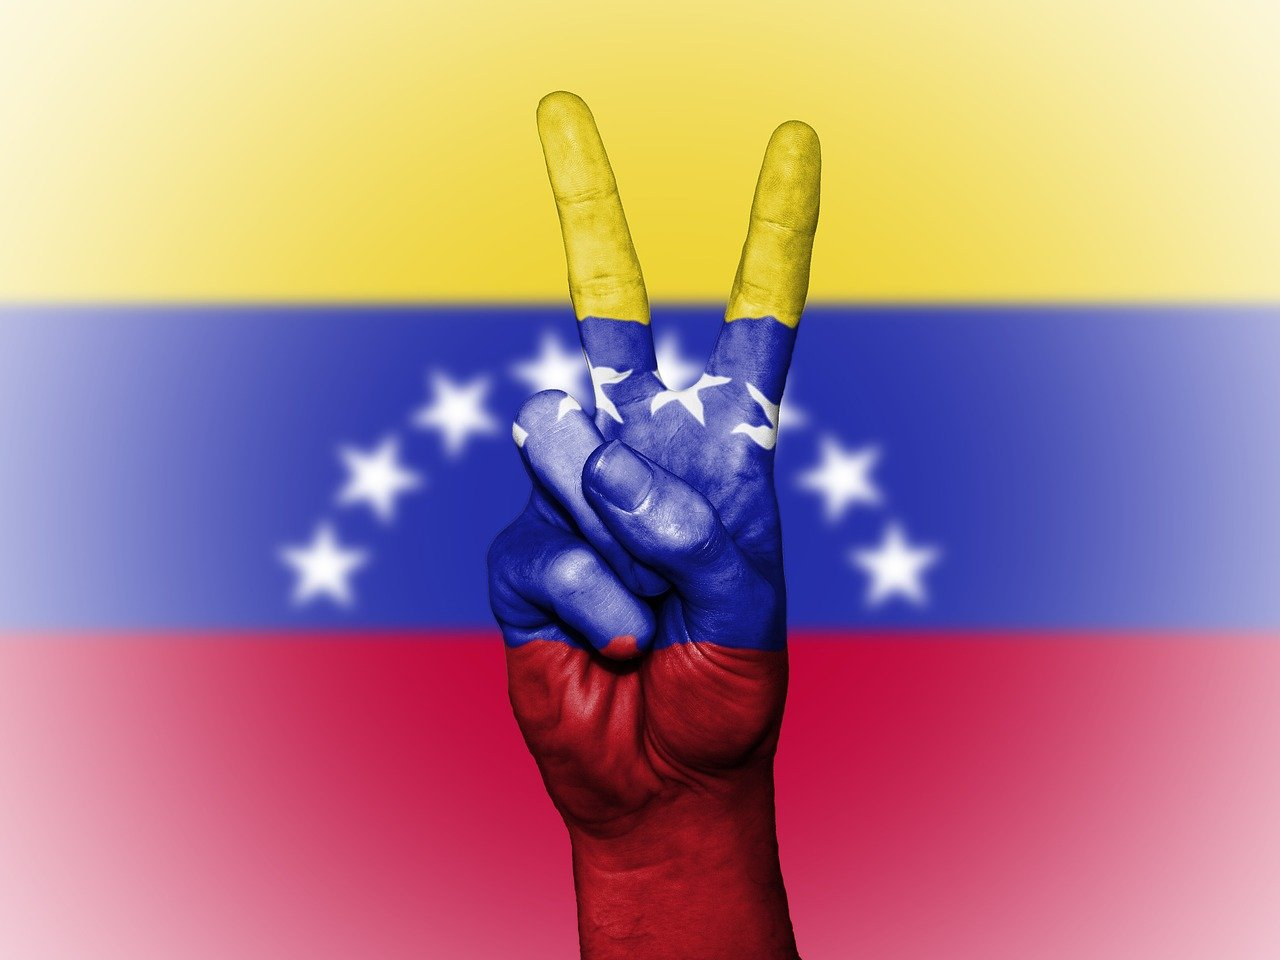 UN human rights experts identify 200 extrajudicial killings by Venezuelan police